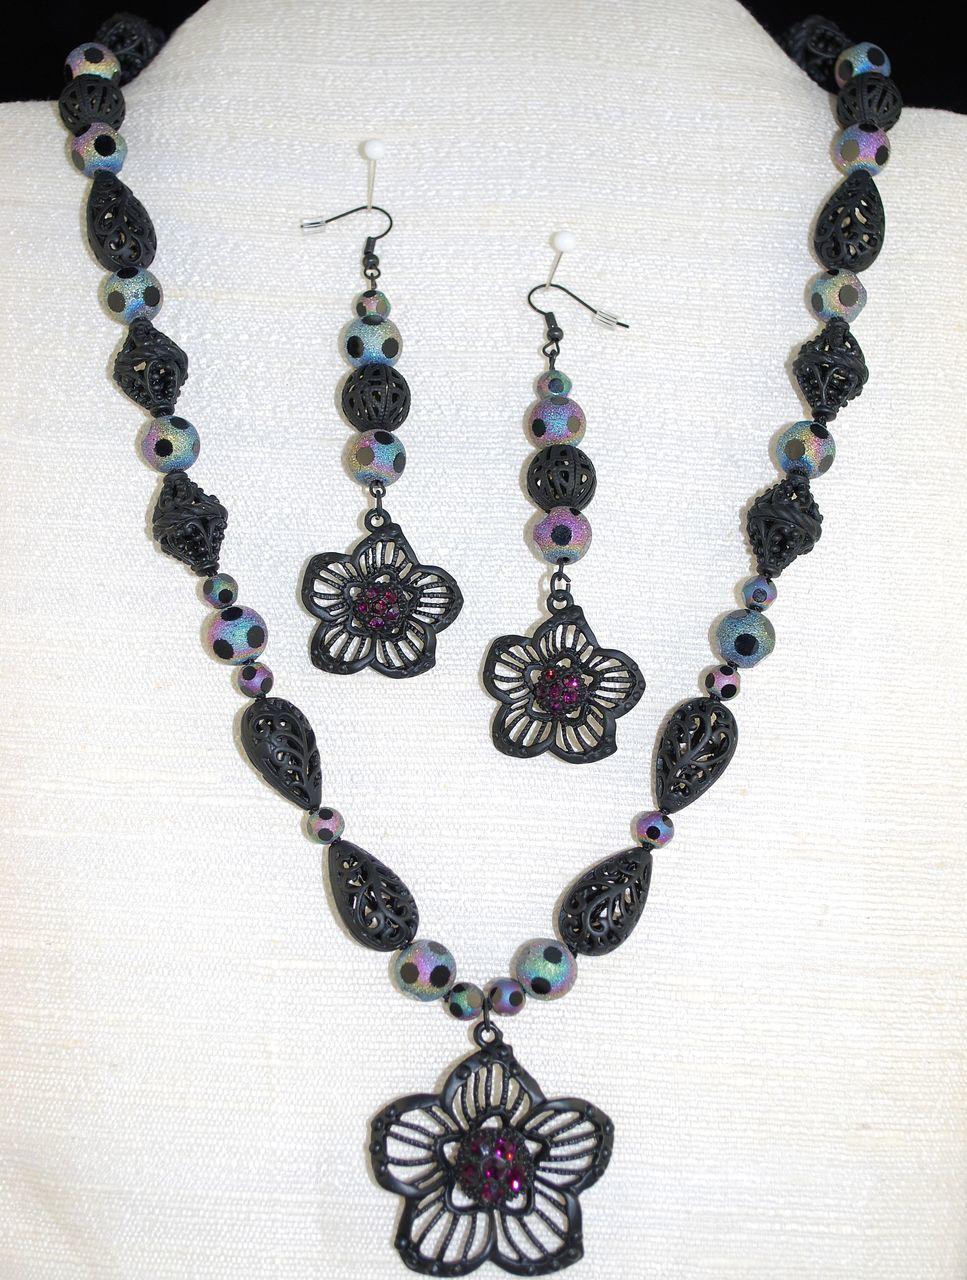 Enchanting Jewelry Creations image 46